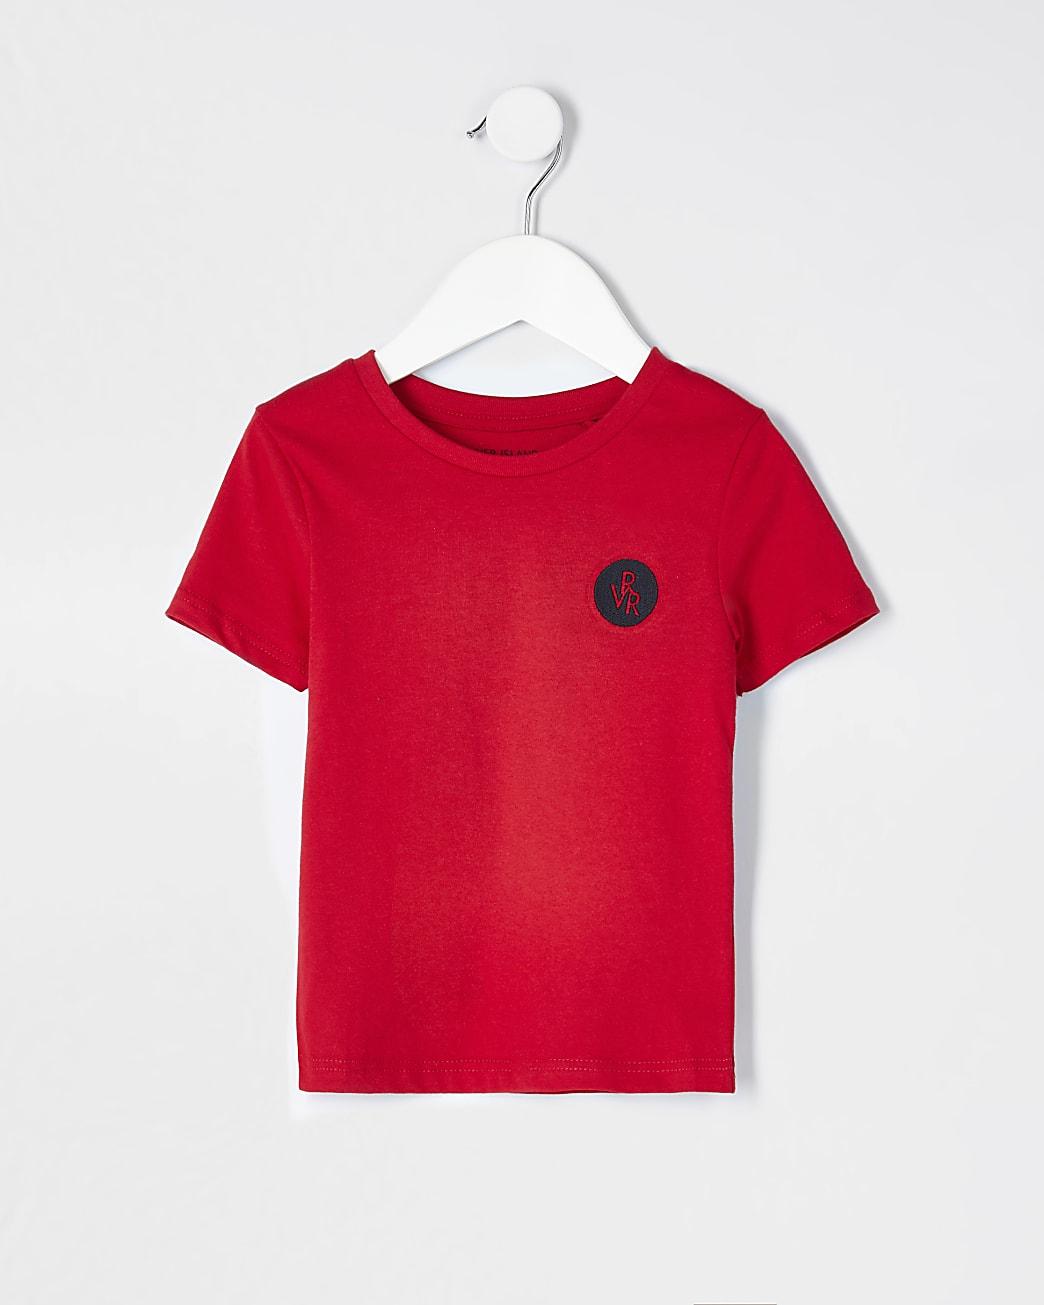 Mini boys red RVR t-shirt